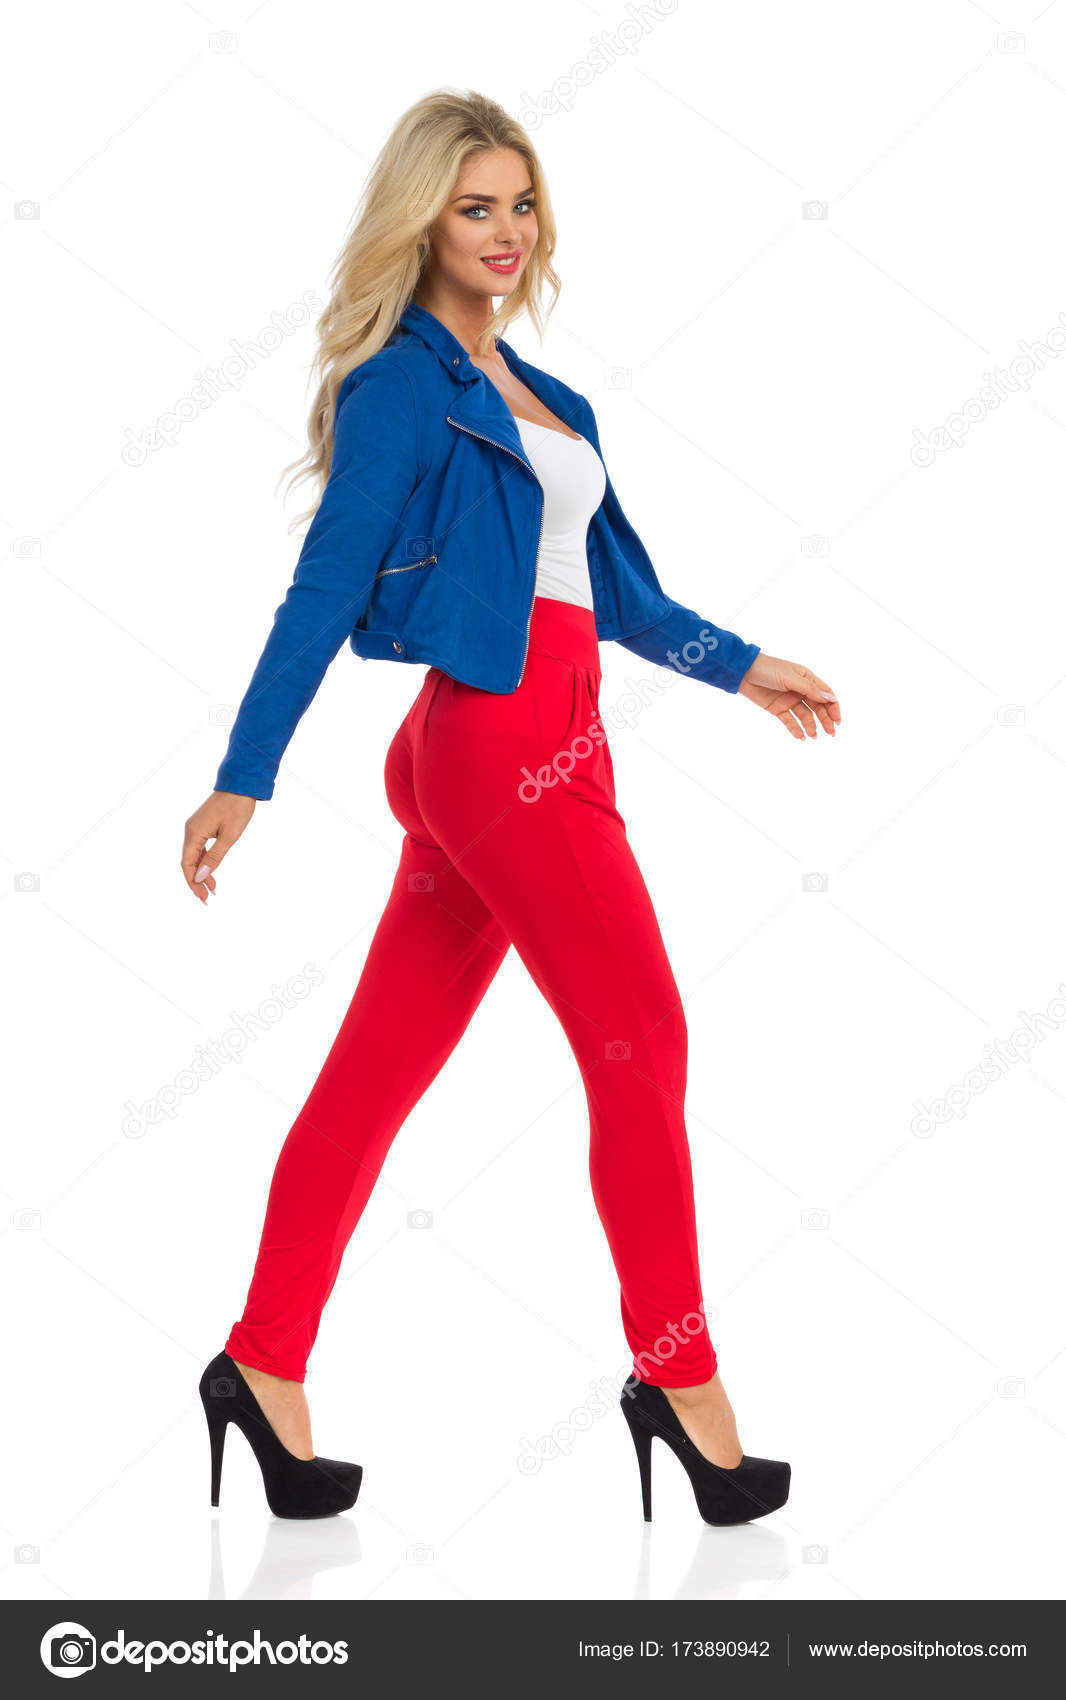 Сексуальная в красных штанах